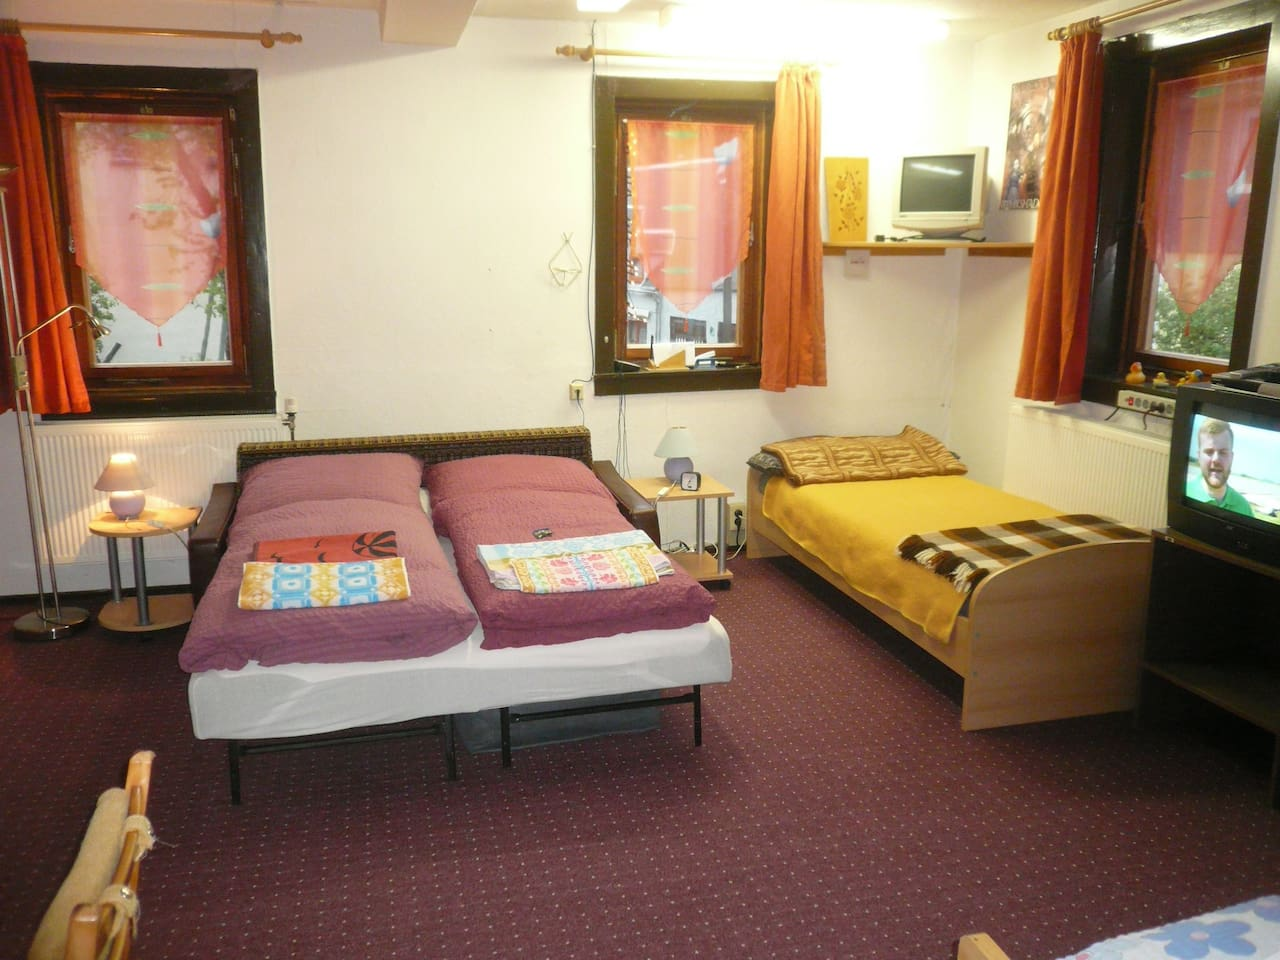 großes, vorderes 4 Bett-Zimmer